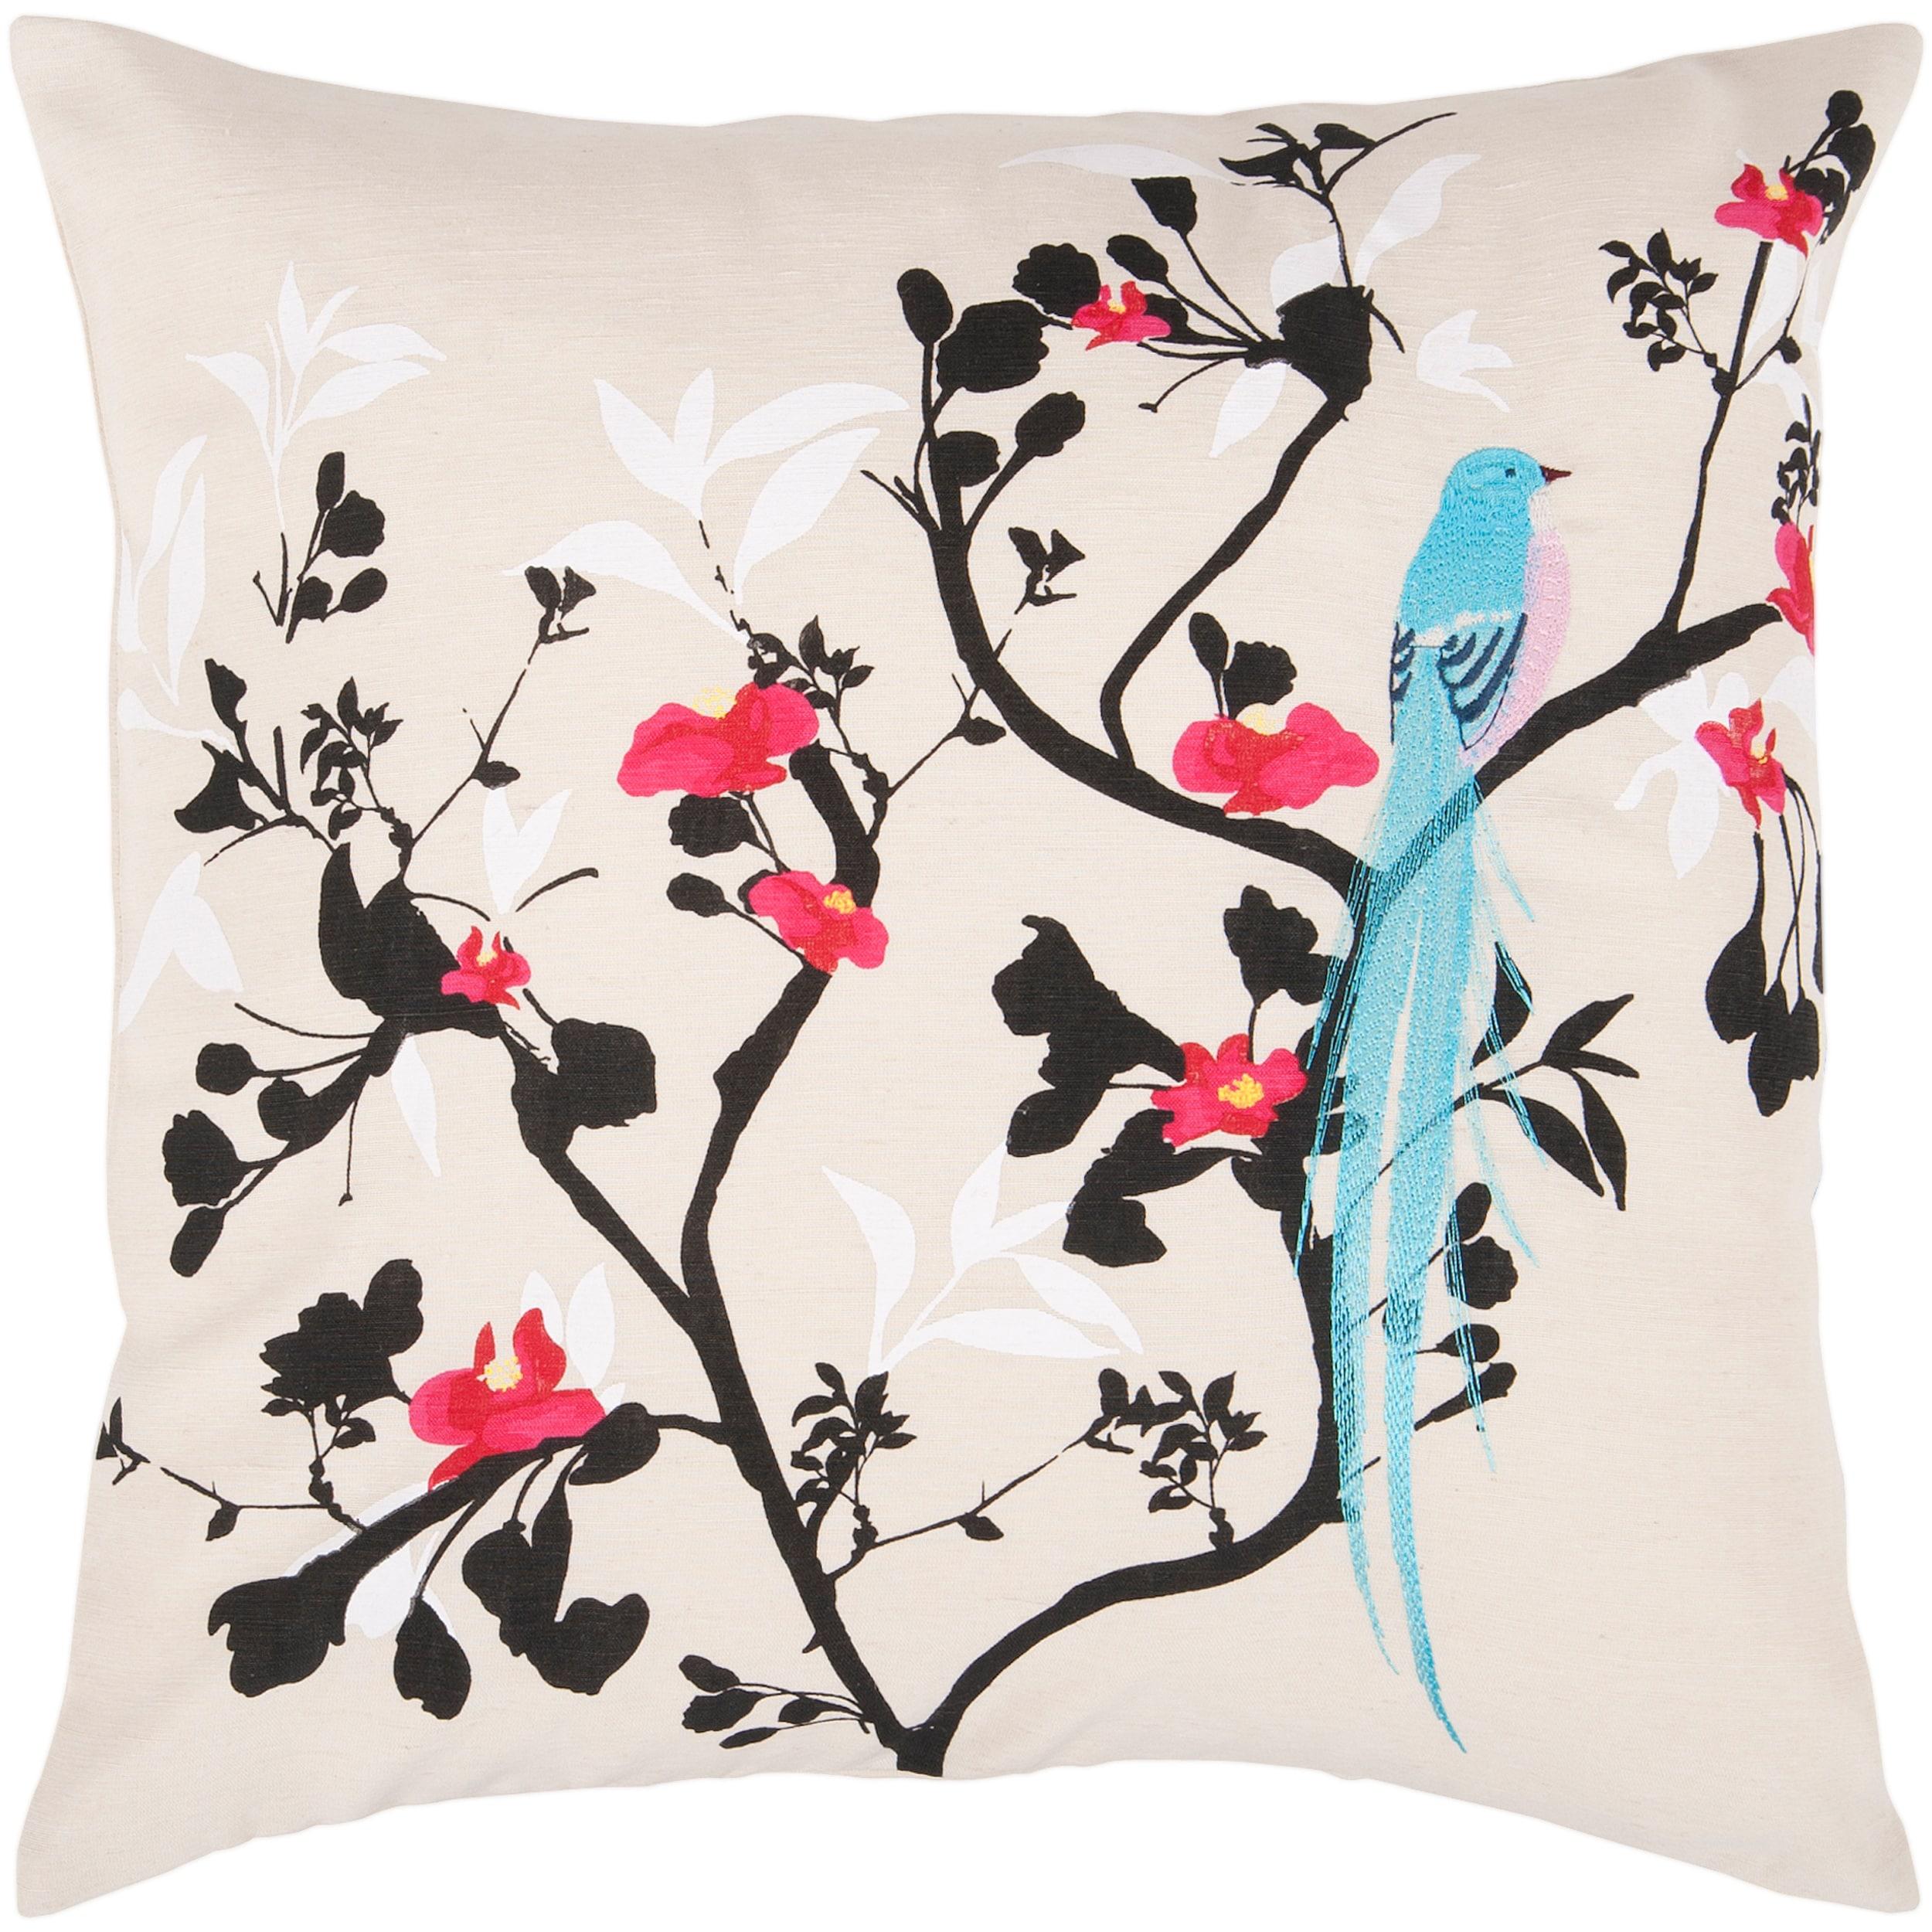 Decorative Luna 22-inch Down Pillow